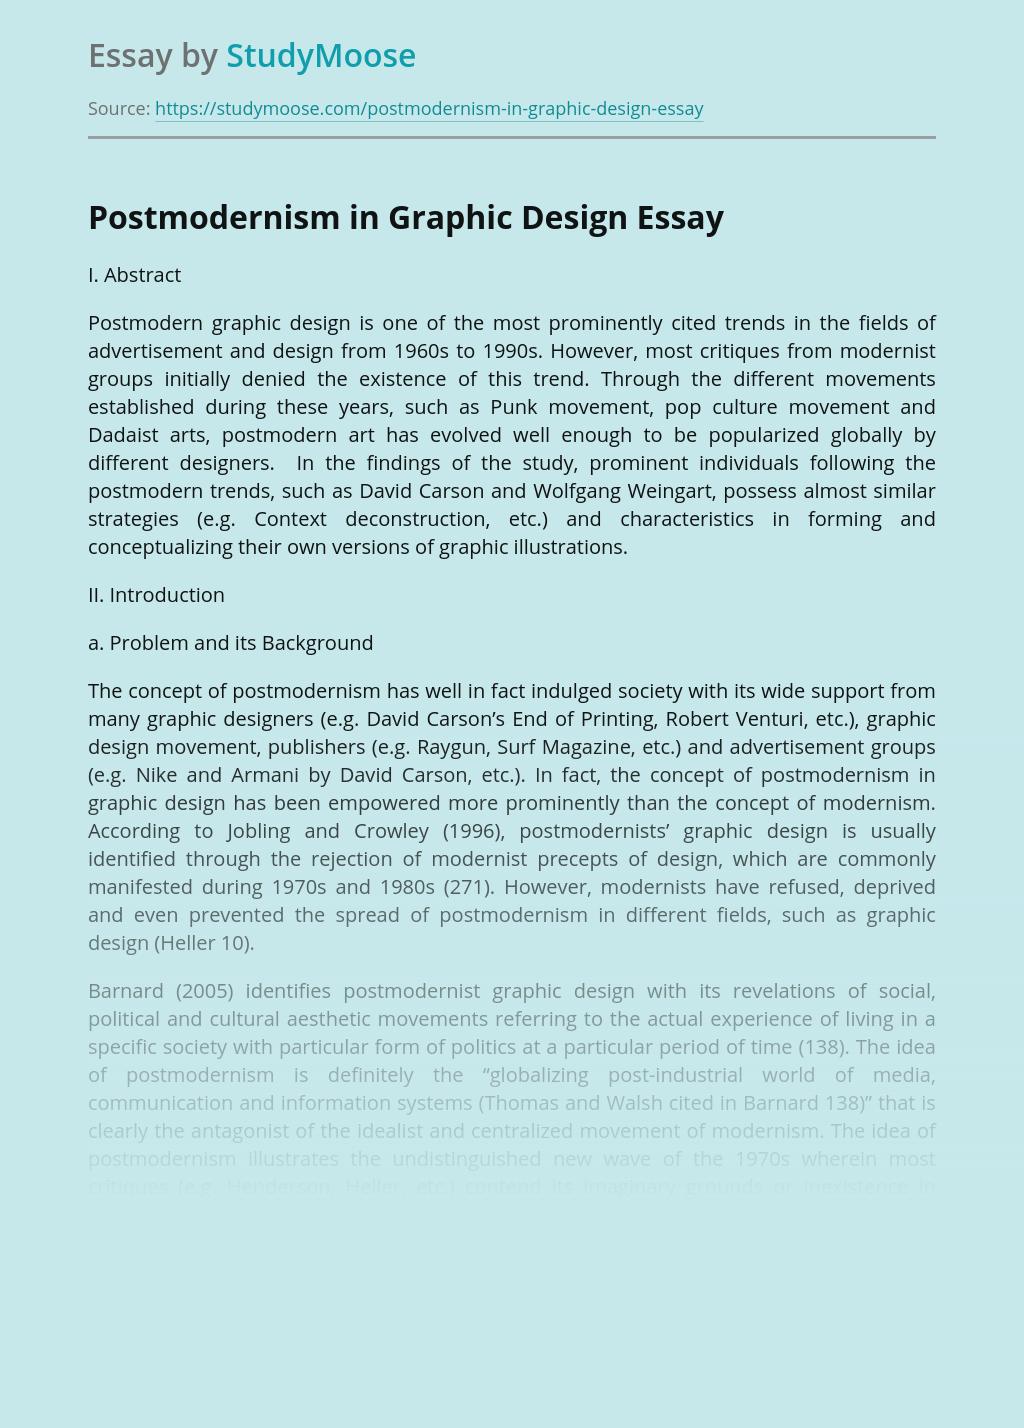 Postmodernism in Graphic Design